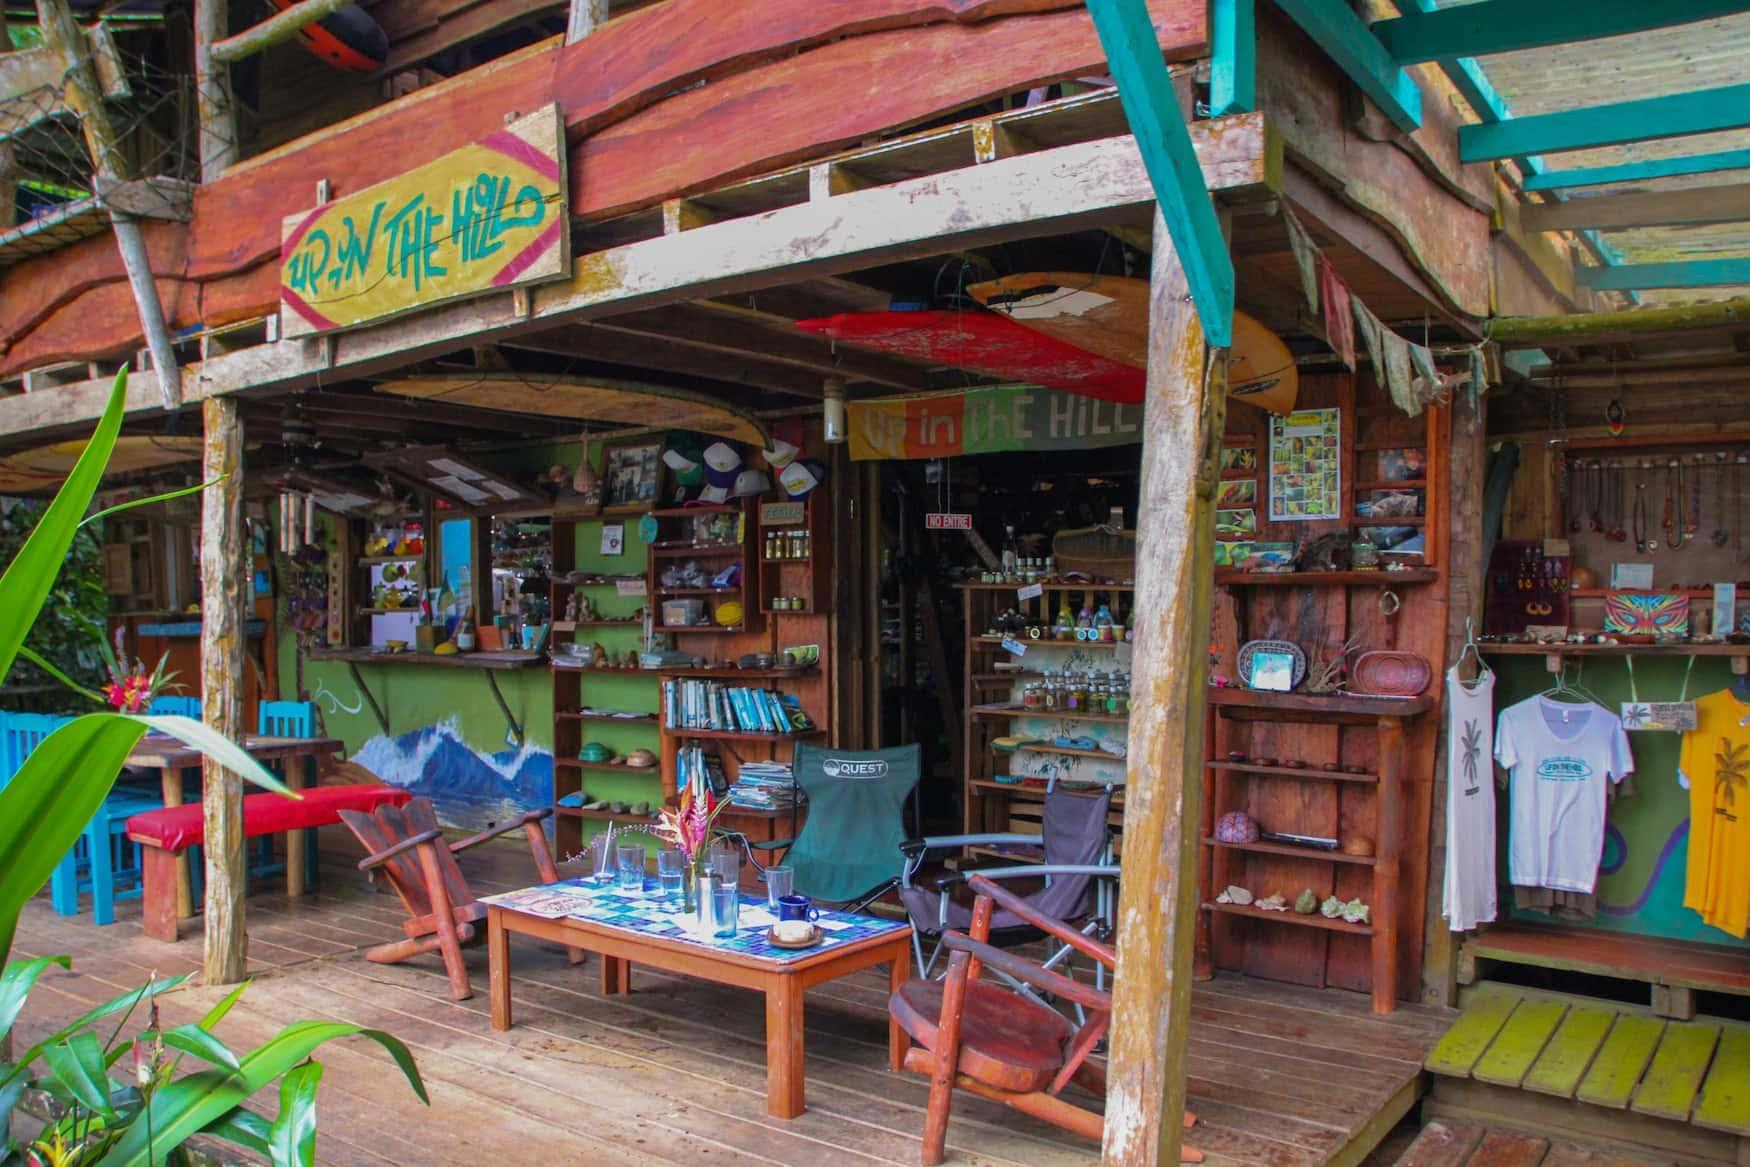 Buntes Eco-Café im Dschungel in Panama